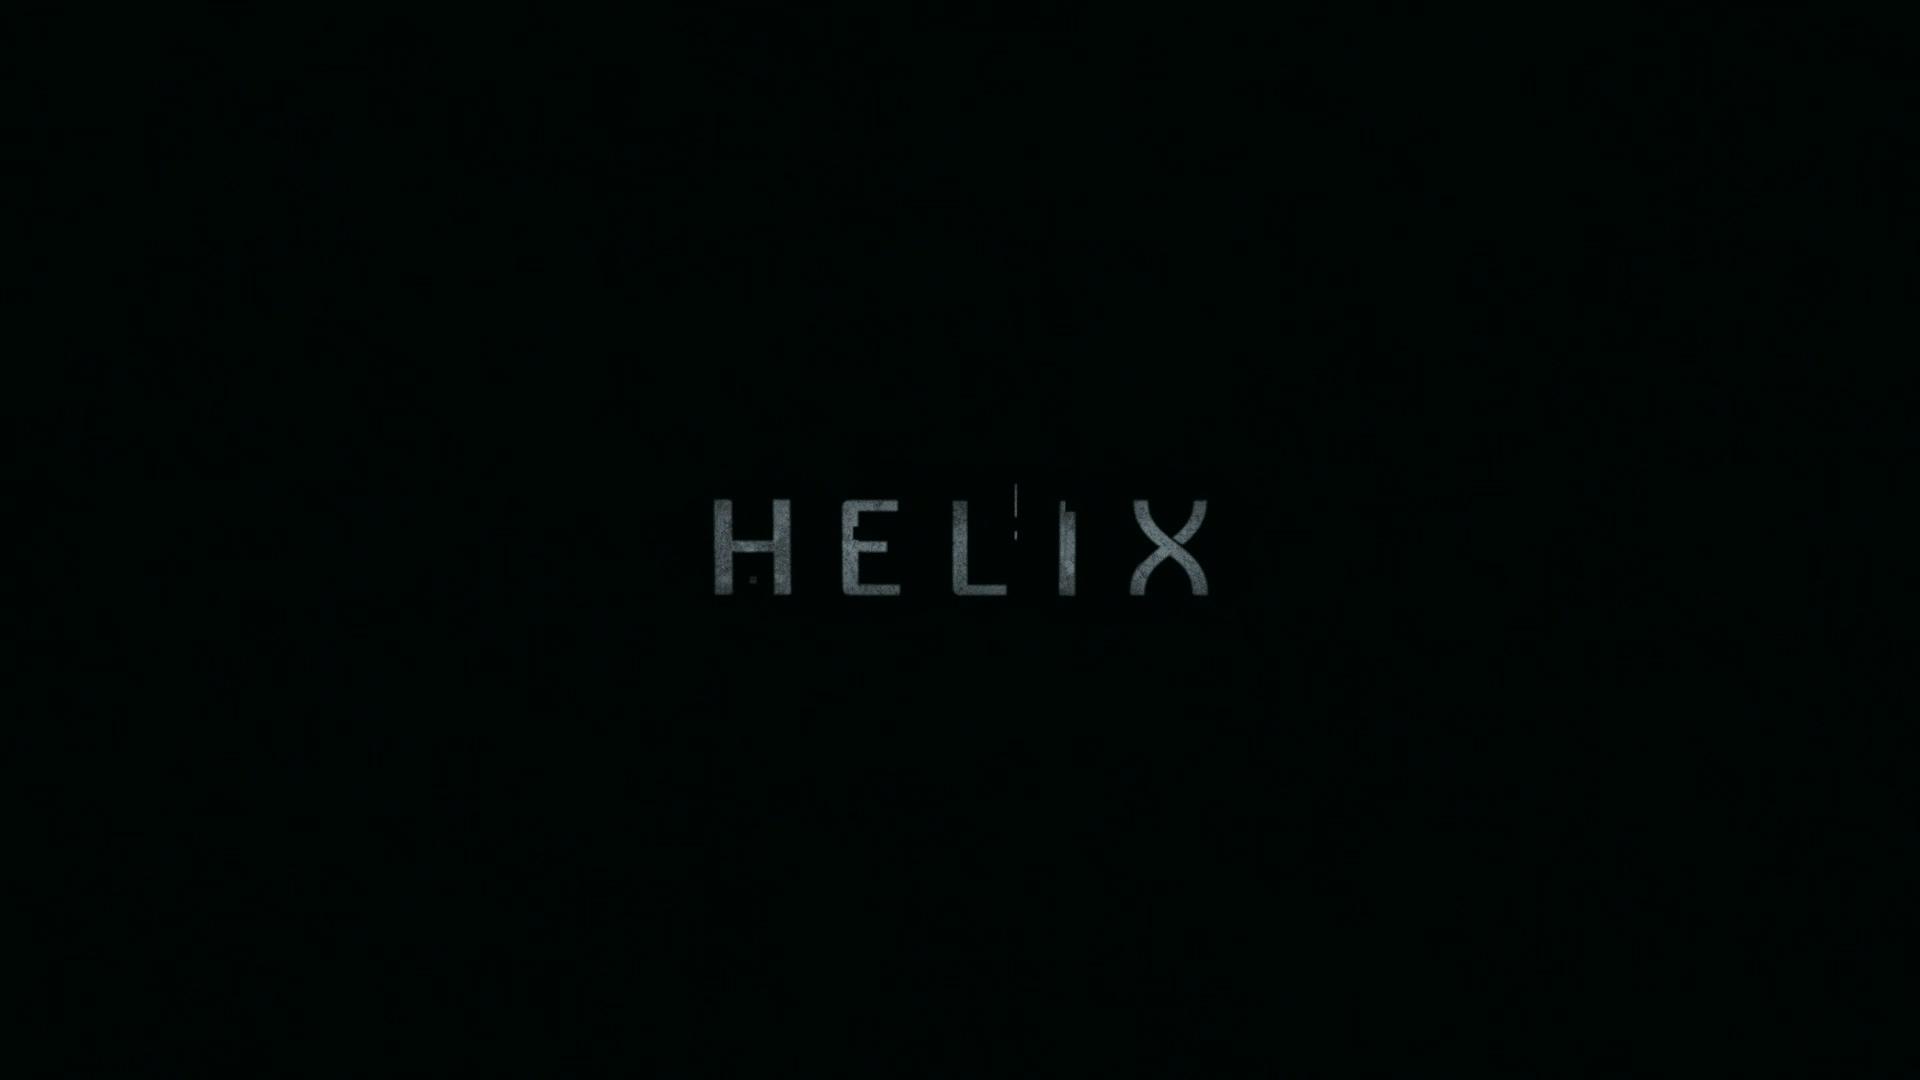 SyFy_Helix_DirCut_Graded.mp4.00_00_56_20.Still012.jpg